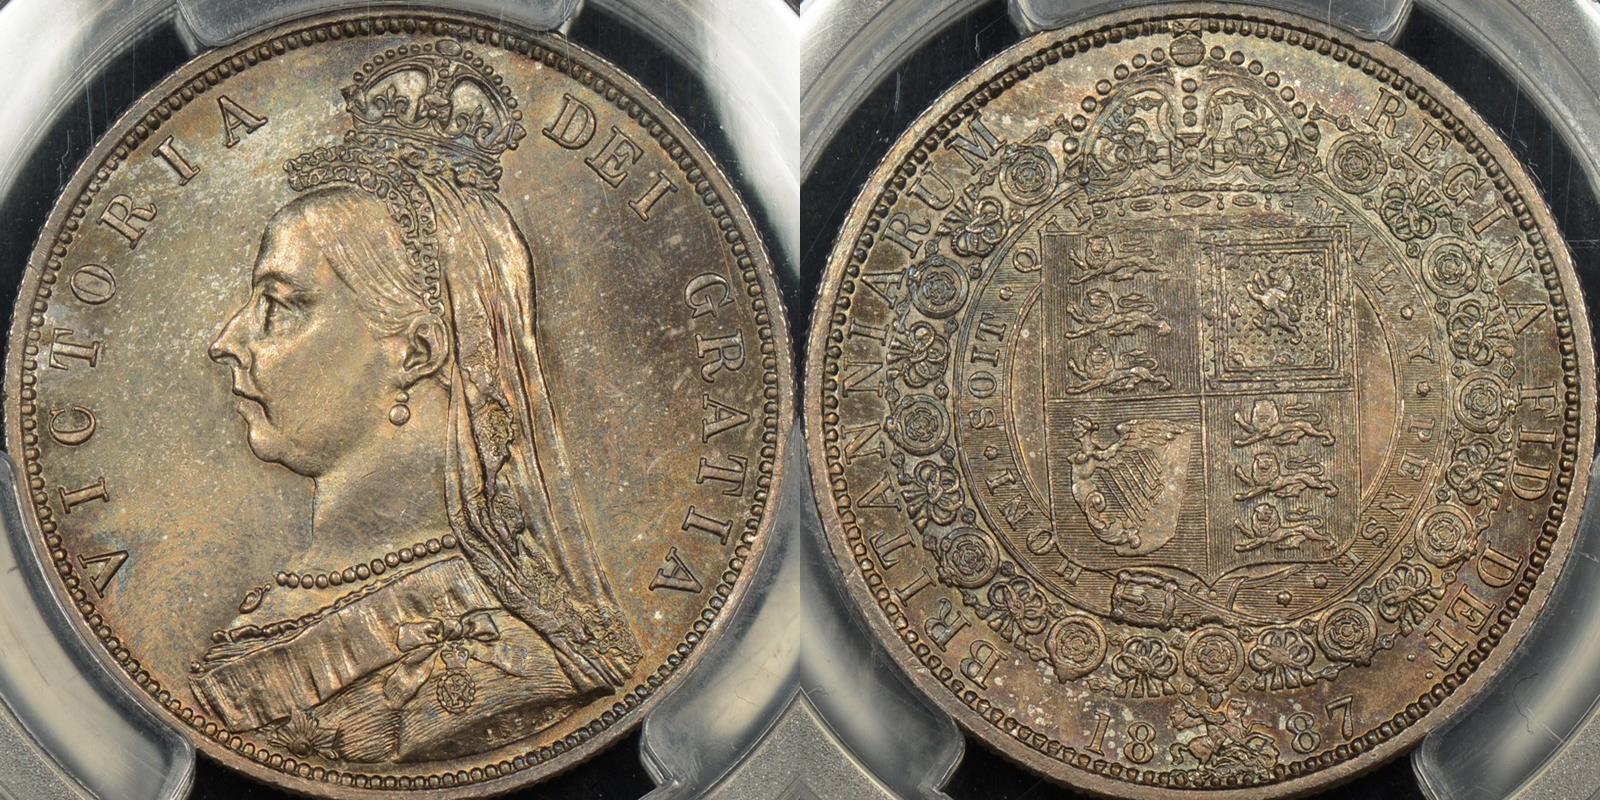 Great britain 1887 half crown 1 2 cr km 764 PCGS MS66 GEM Uncirculated